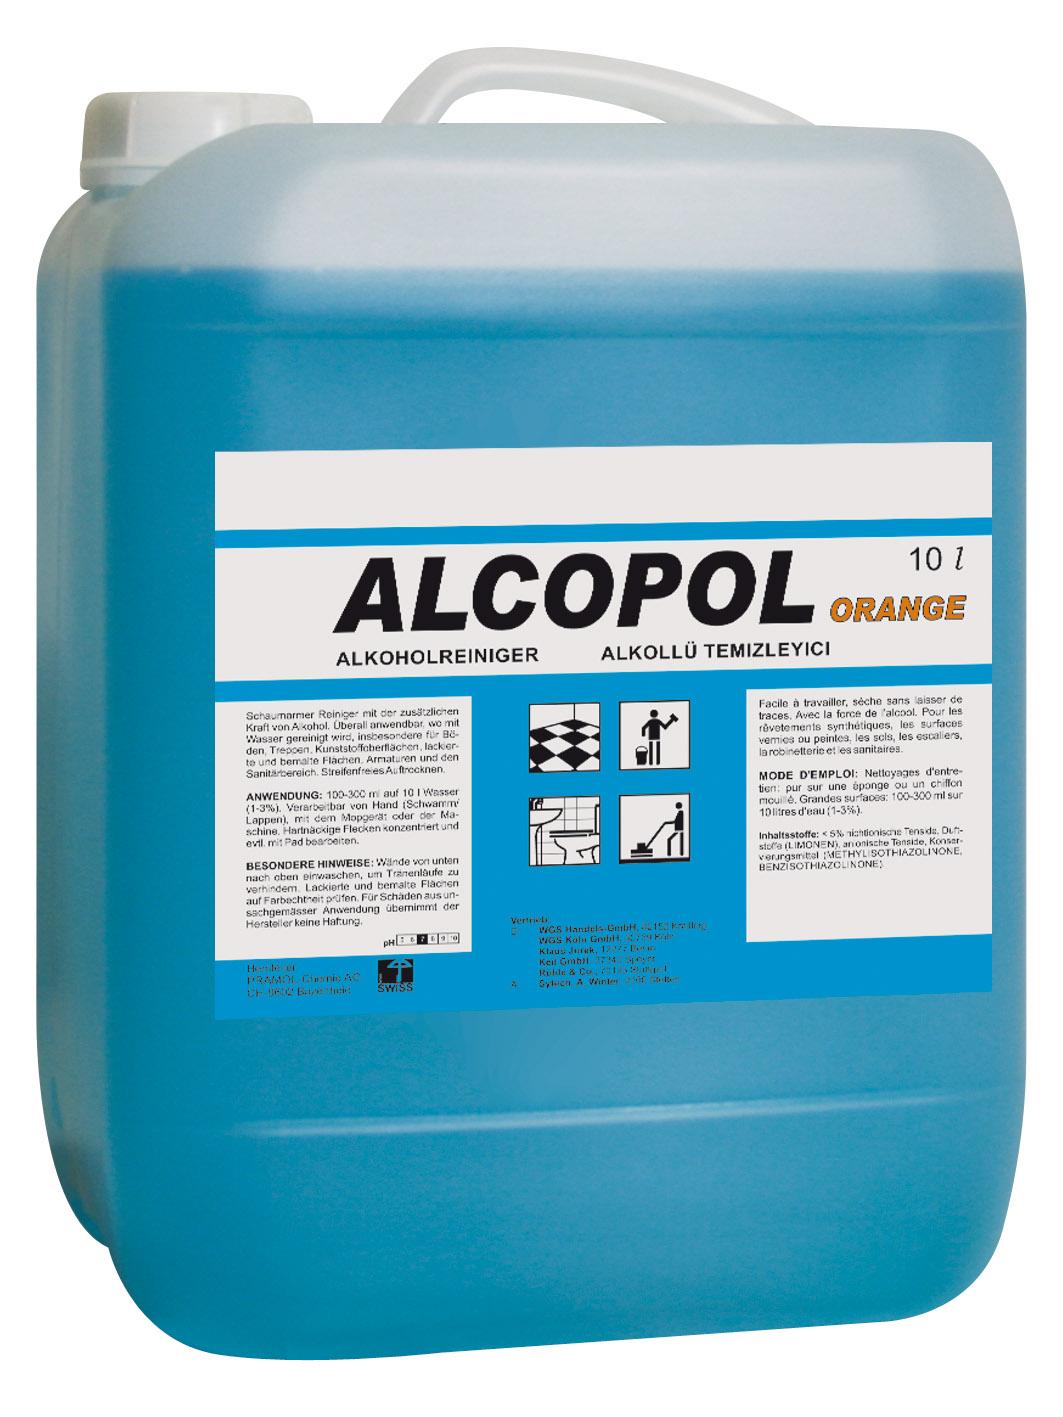 Pramol ALCOPOL orange Alkoholreiniger, 10 Liter